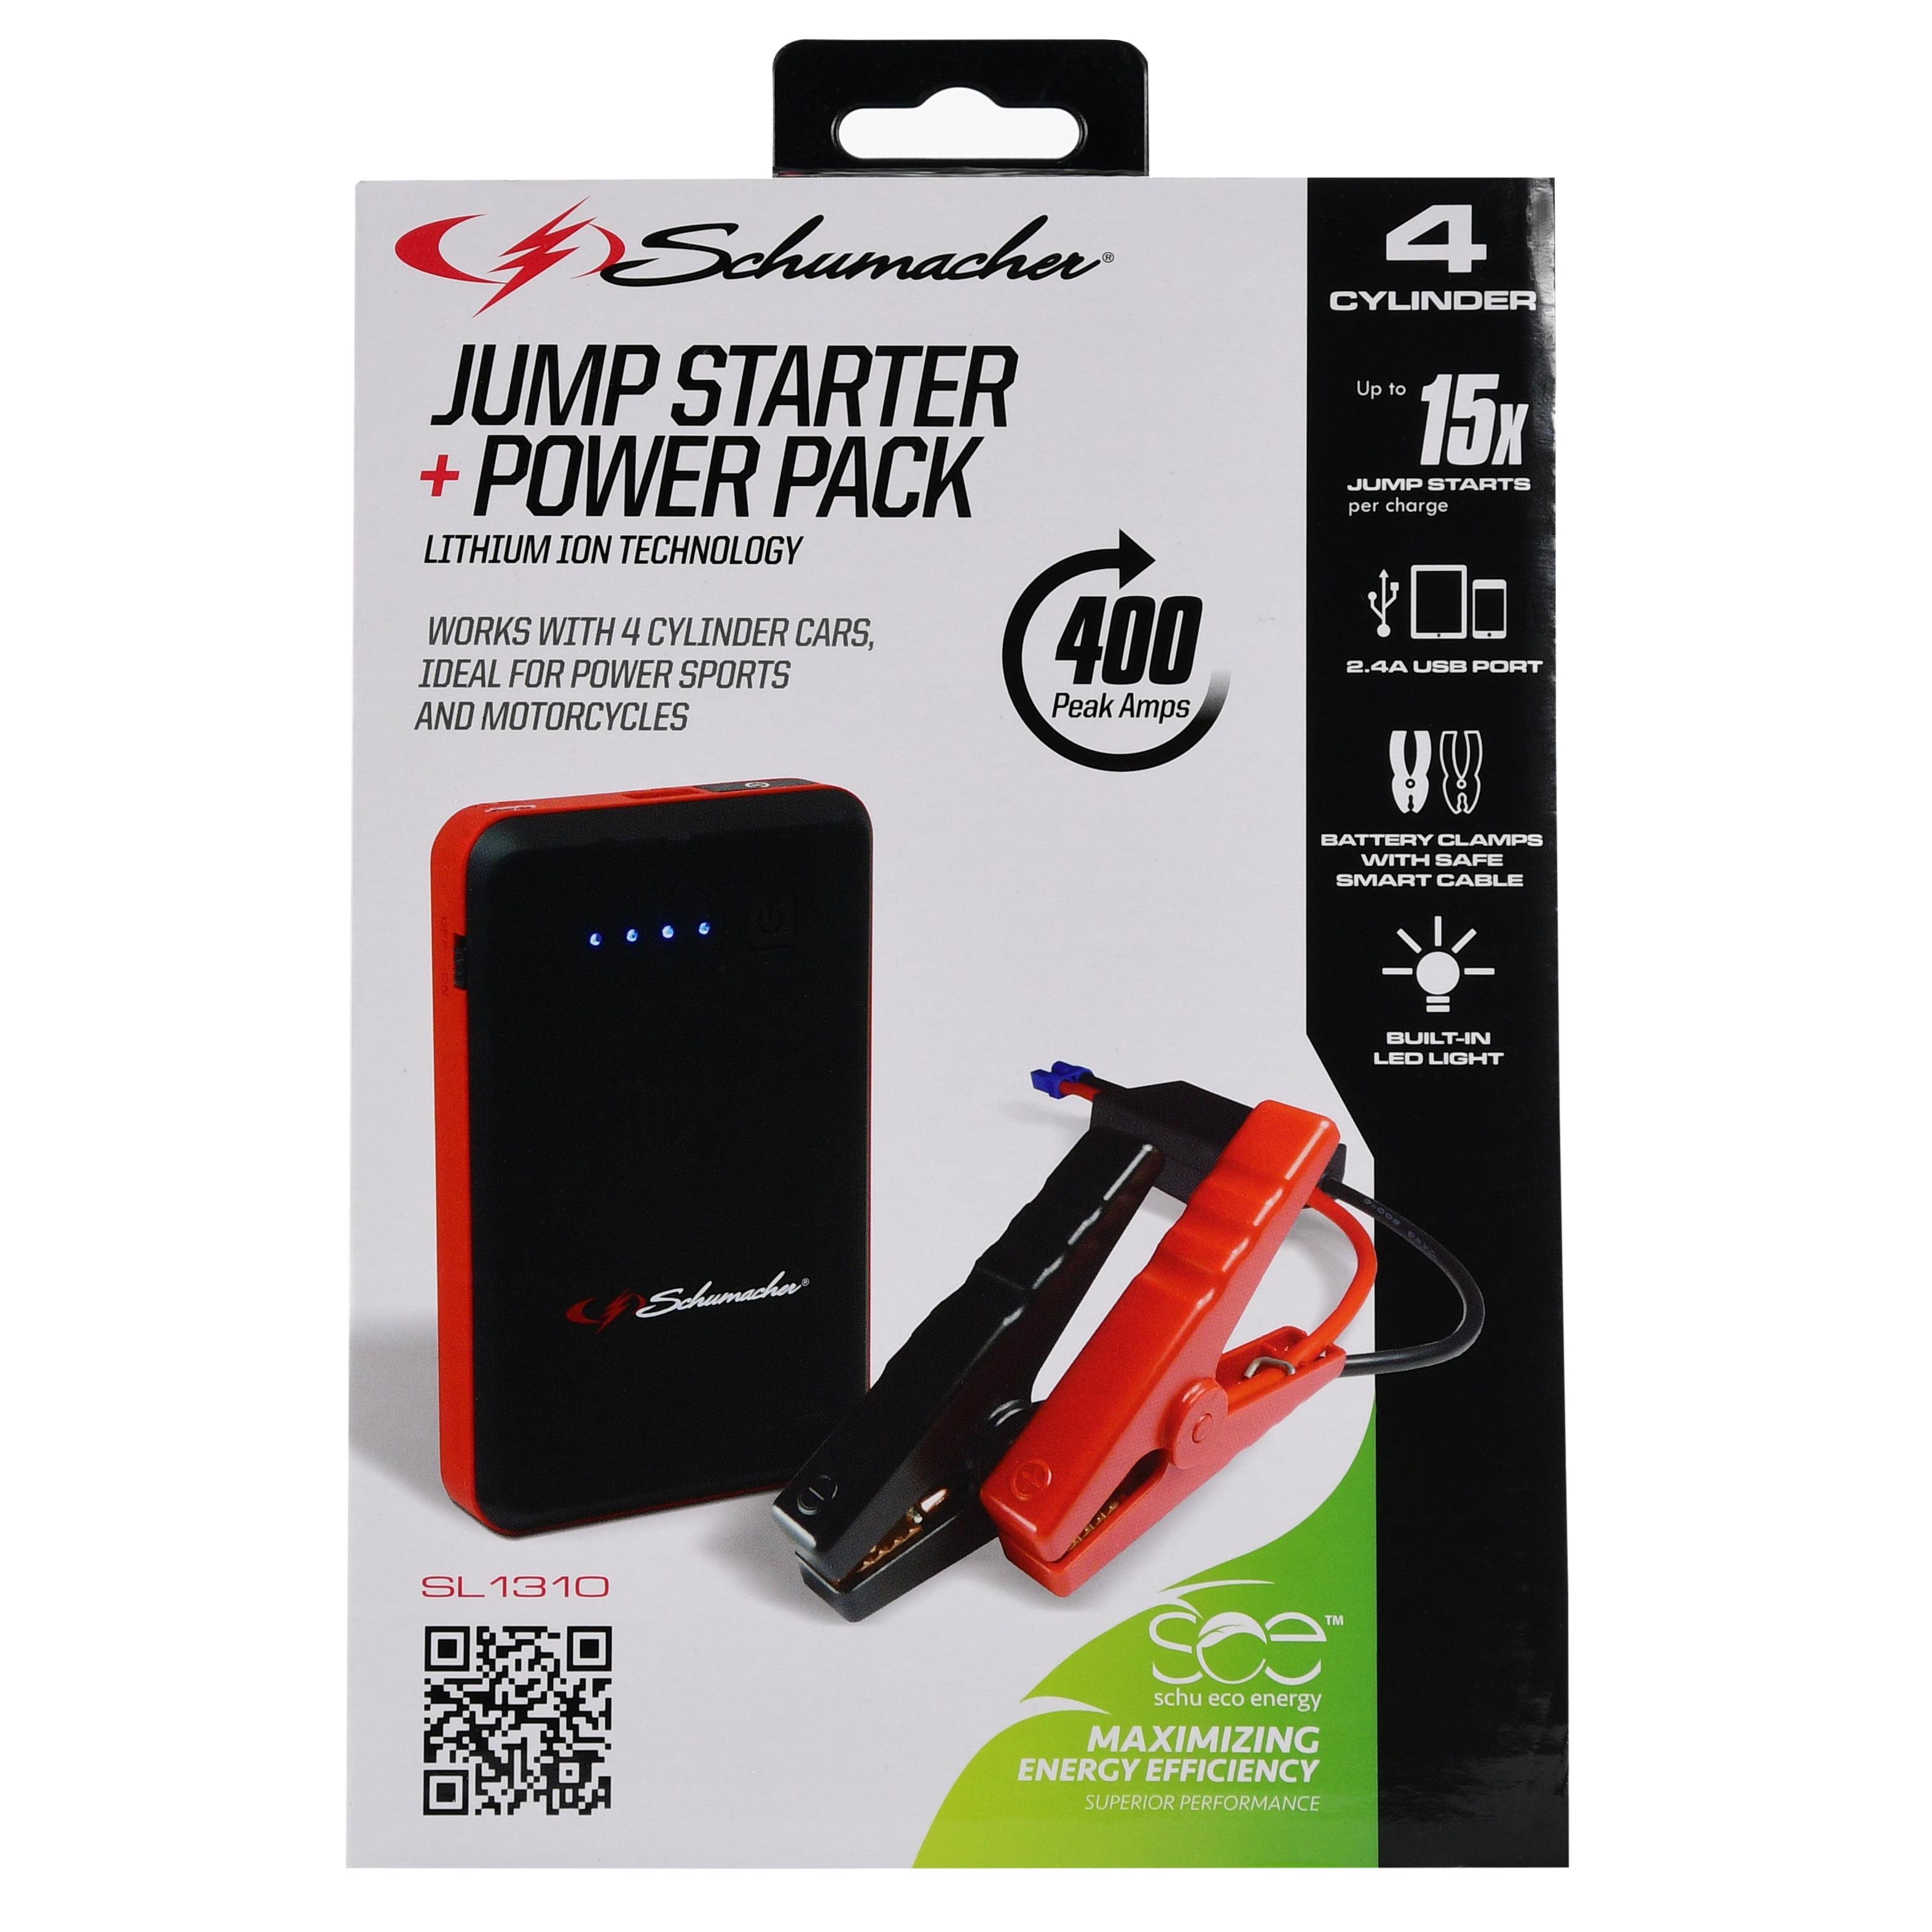 Schumacher Electric 400 Amp Lithium Ion Jumpstarter - Walmart.com